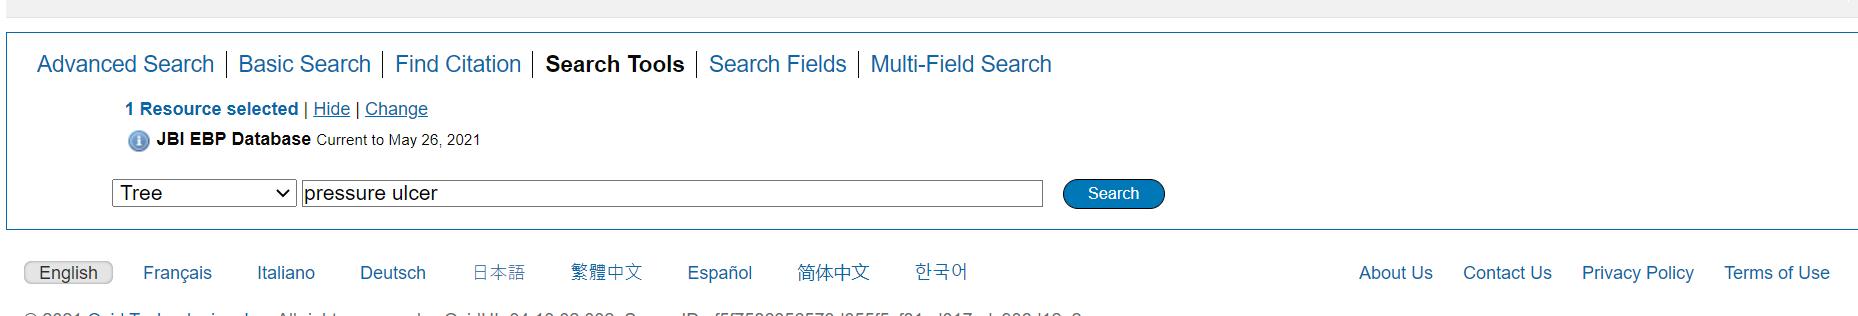 JBI search options